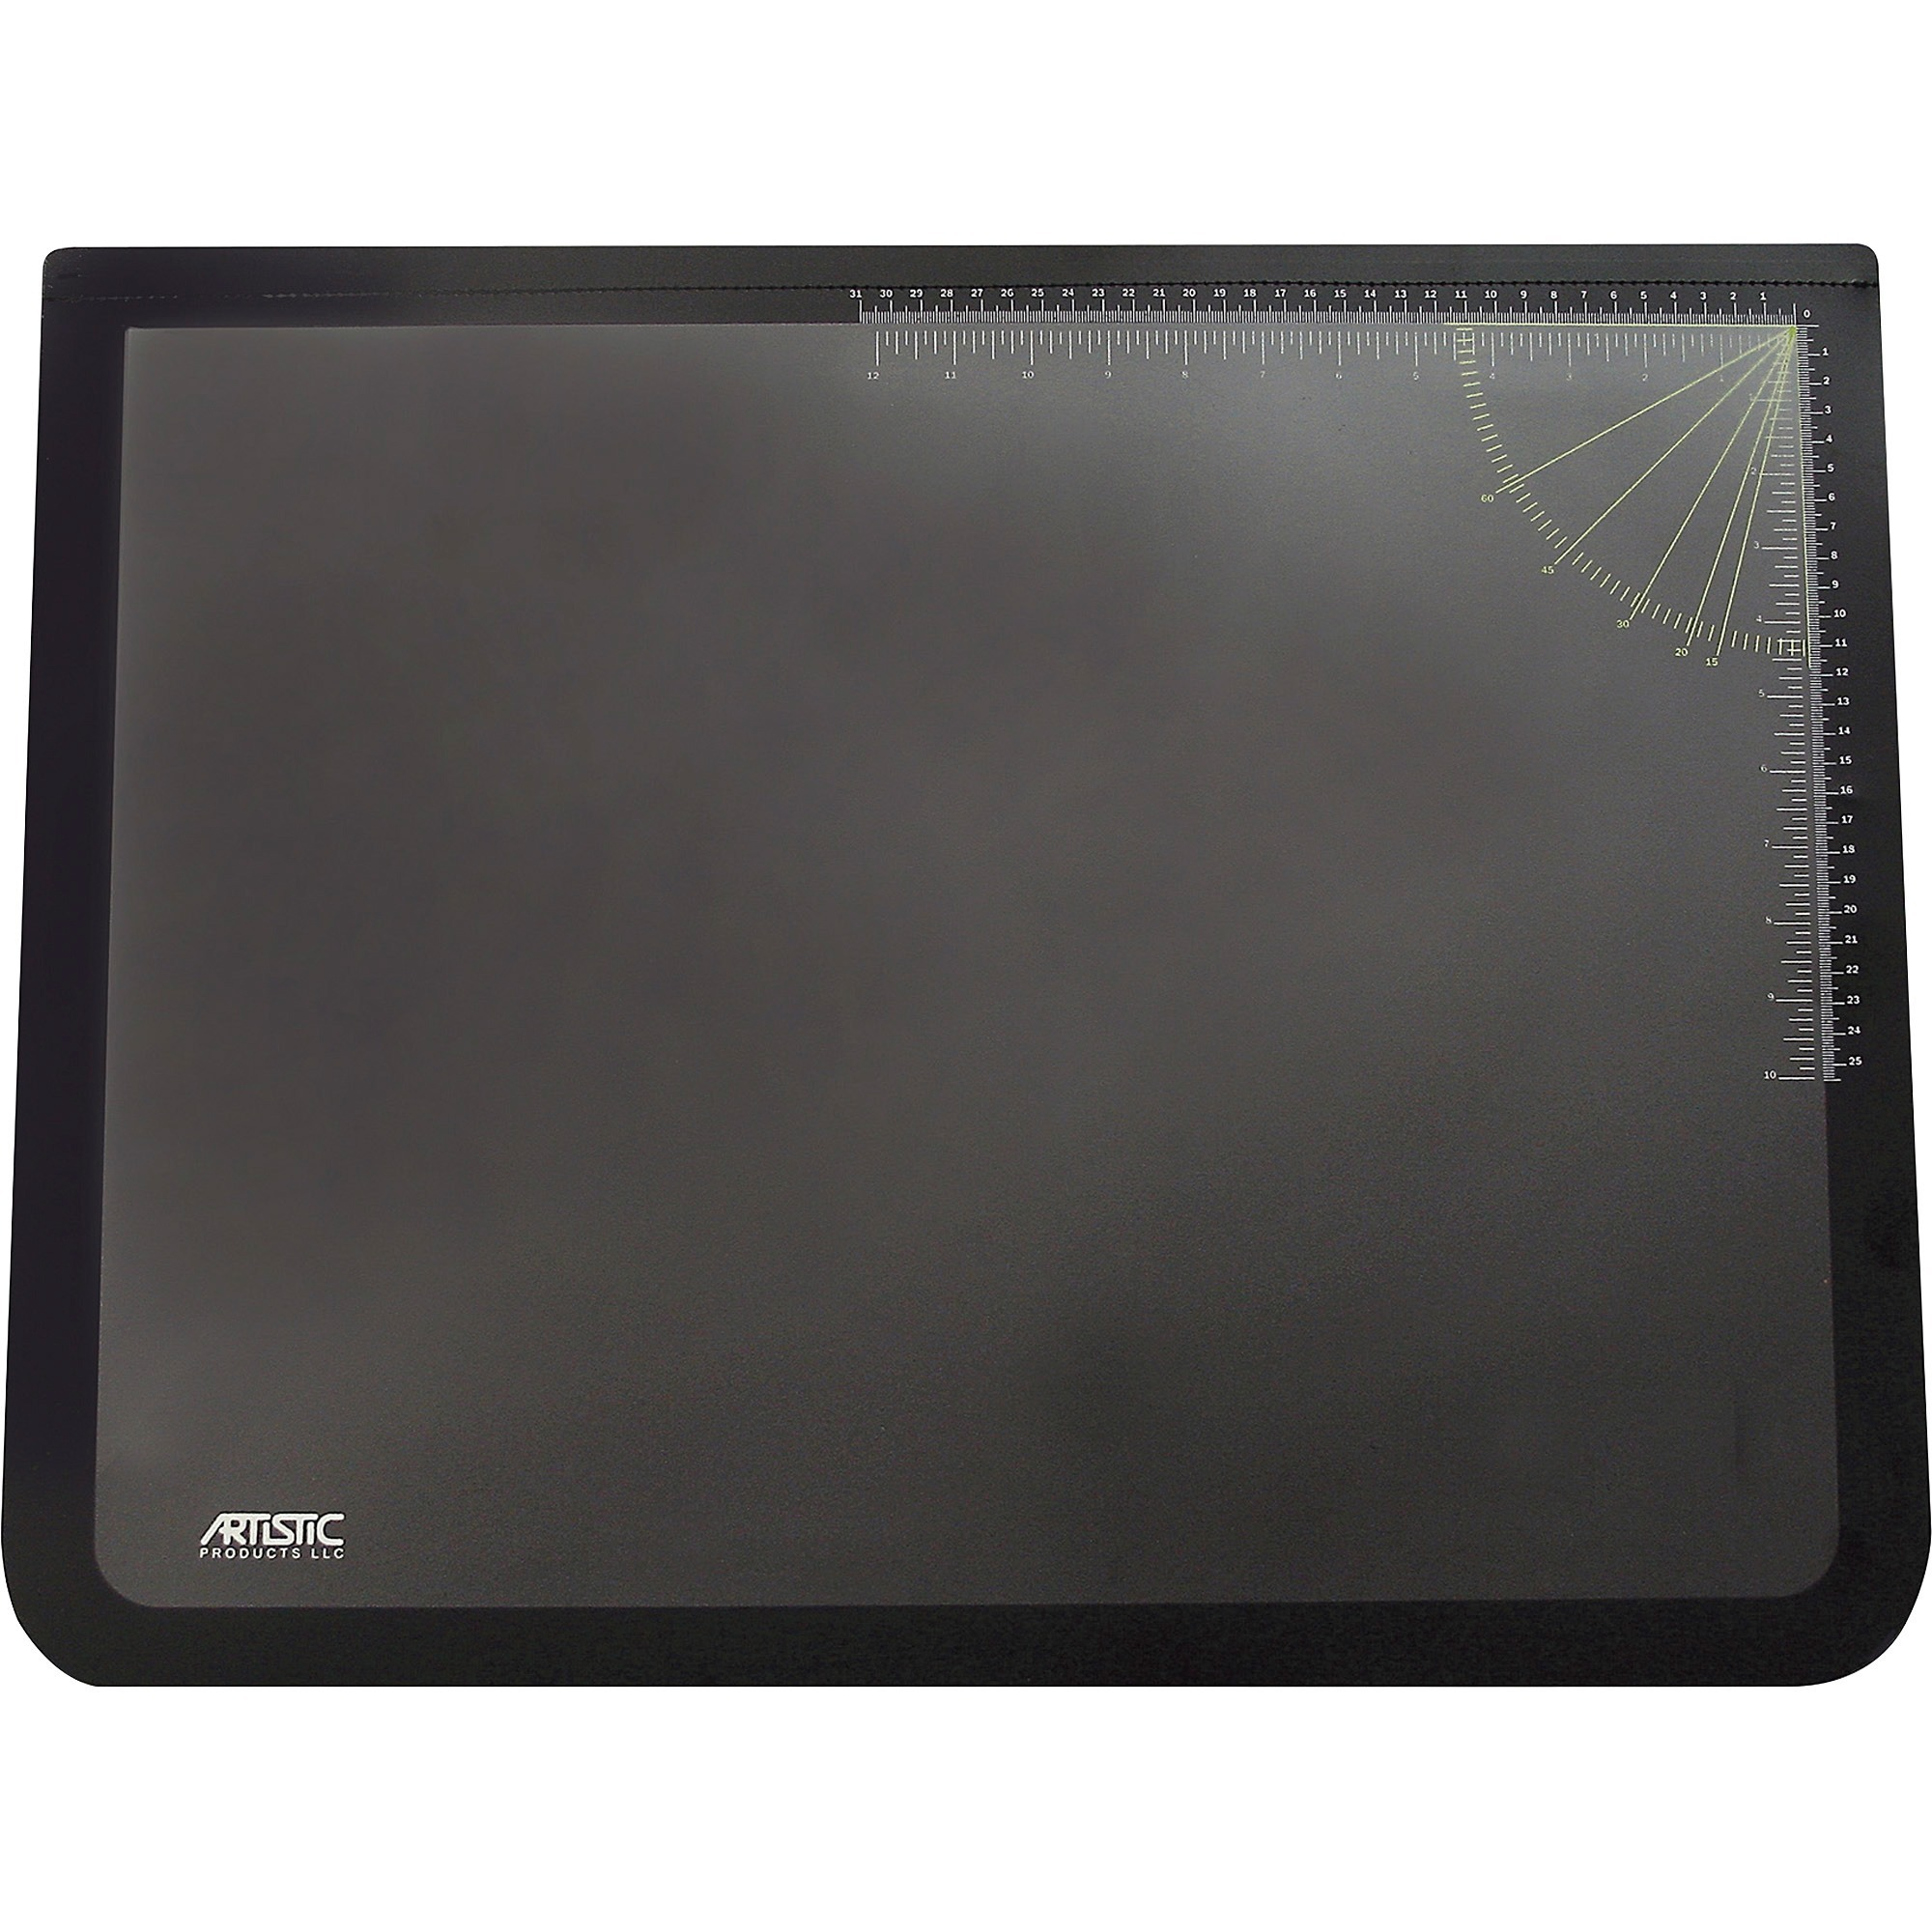 Artistic Logo Desktop Organizer Pad Rectangle 24 609 60 Mm Width X 19 482 Depth Rubber Plastic Black